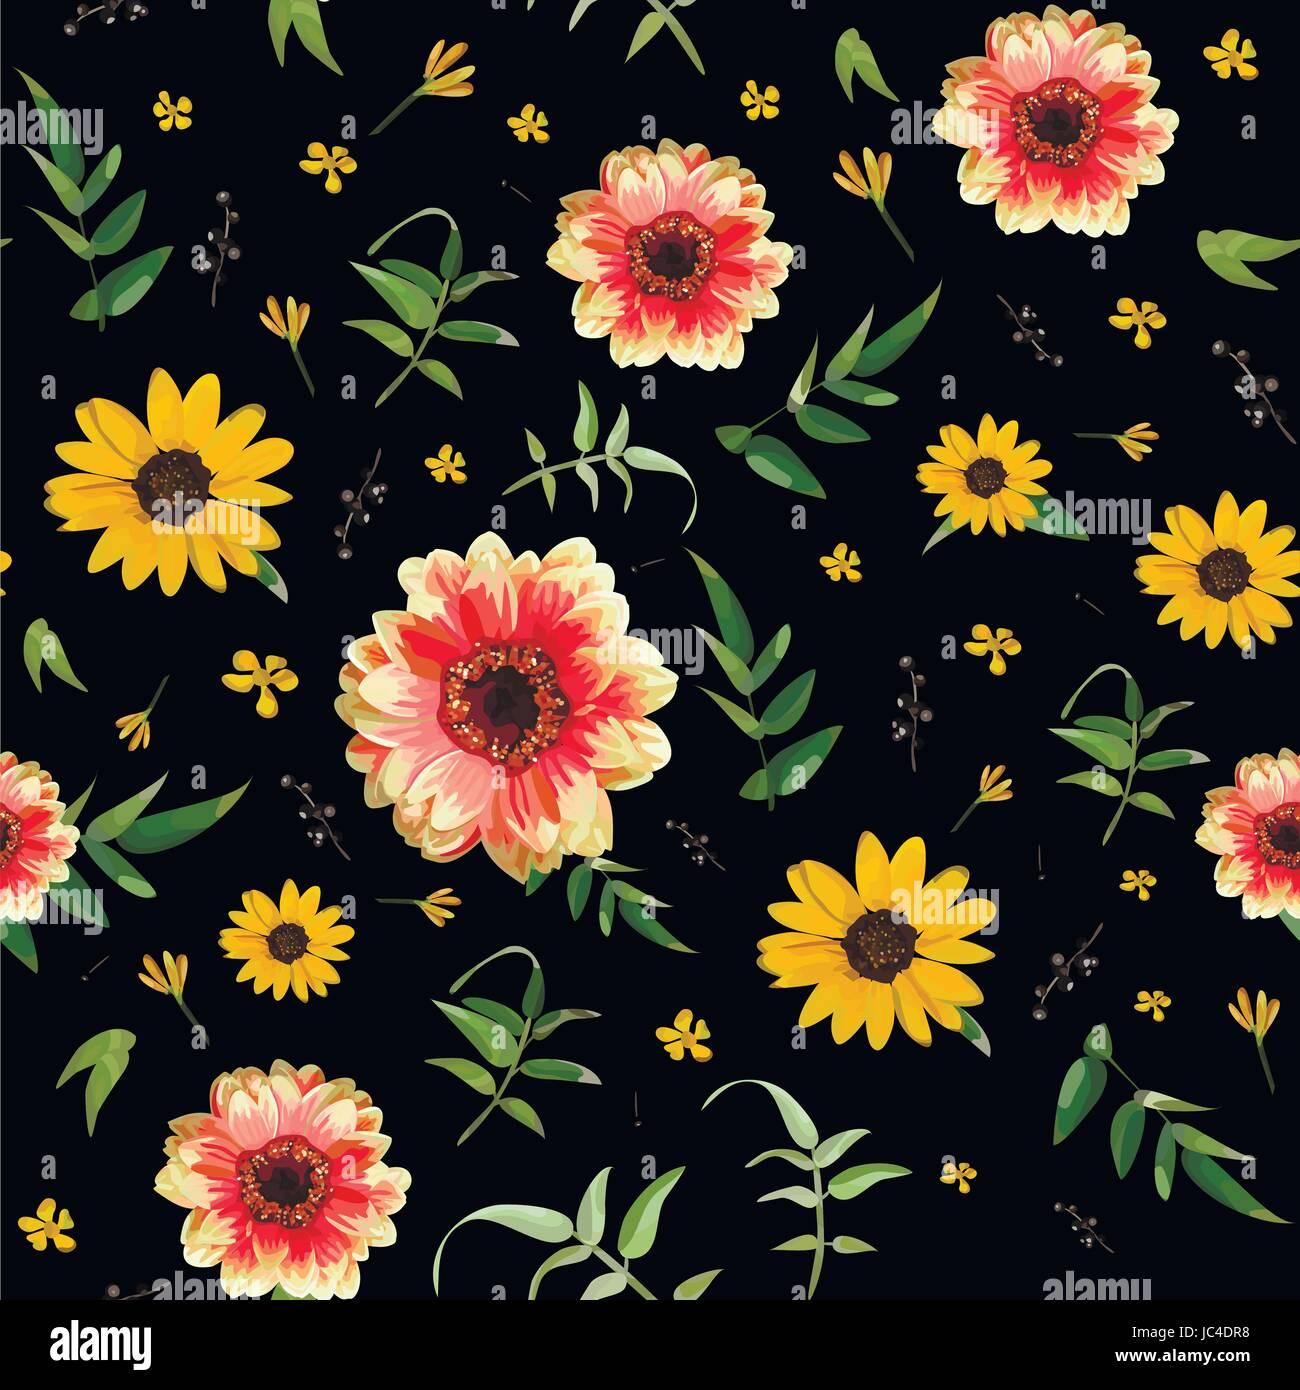 Vintage Floral Orange Dahlia Flower Yellow Sunflower Tiny